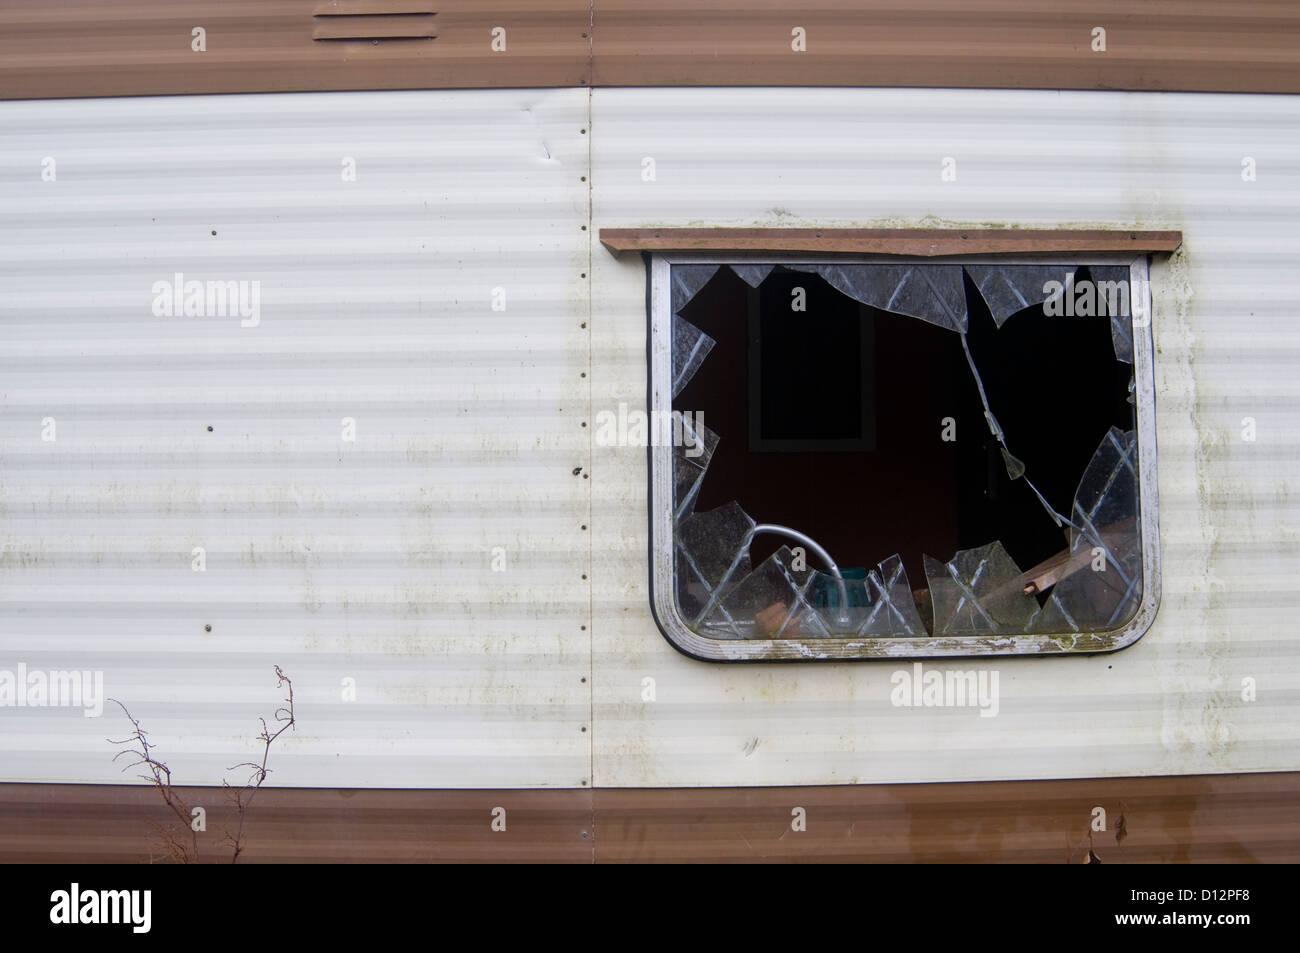 derelict mobile home homes trashed smashed window windows vandalized ...